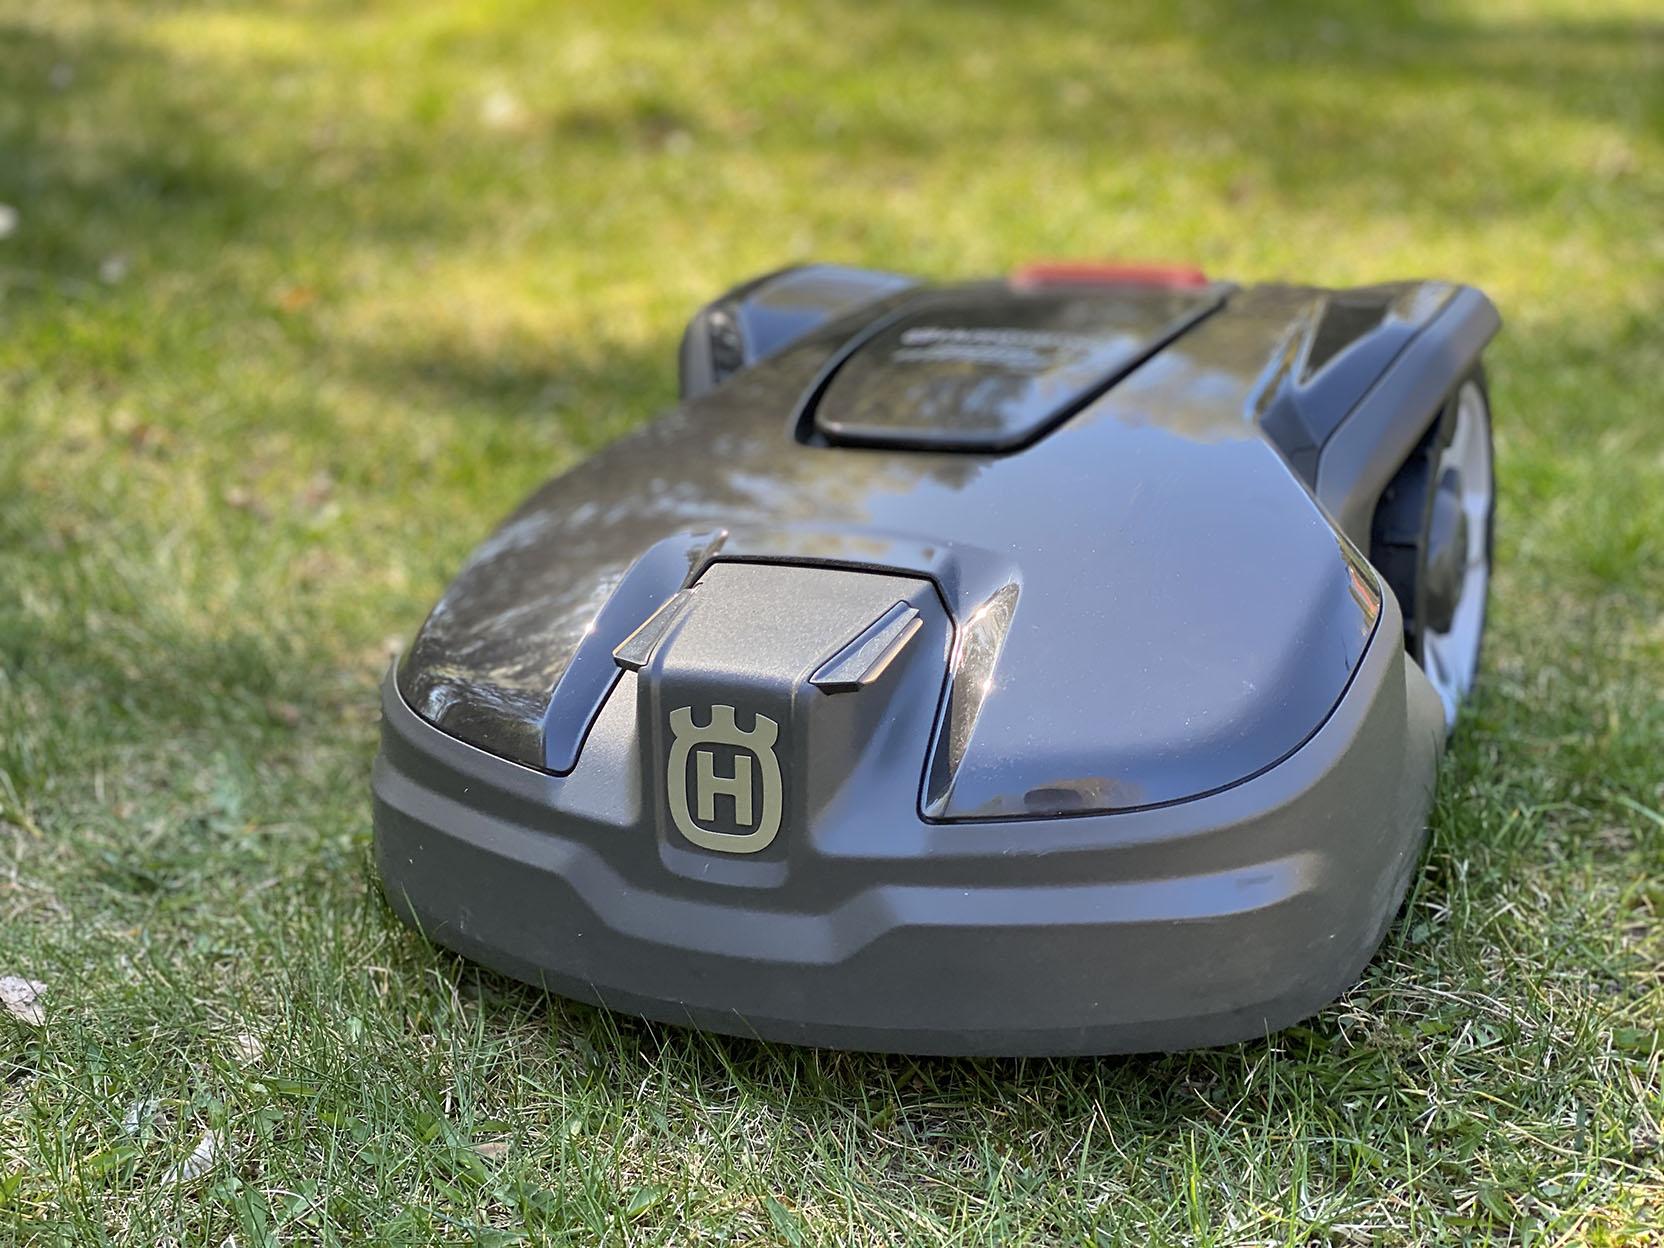 The Husqvarna Automower 305 is Husqvarna's smallest robotic lawn mower